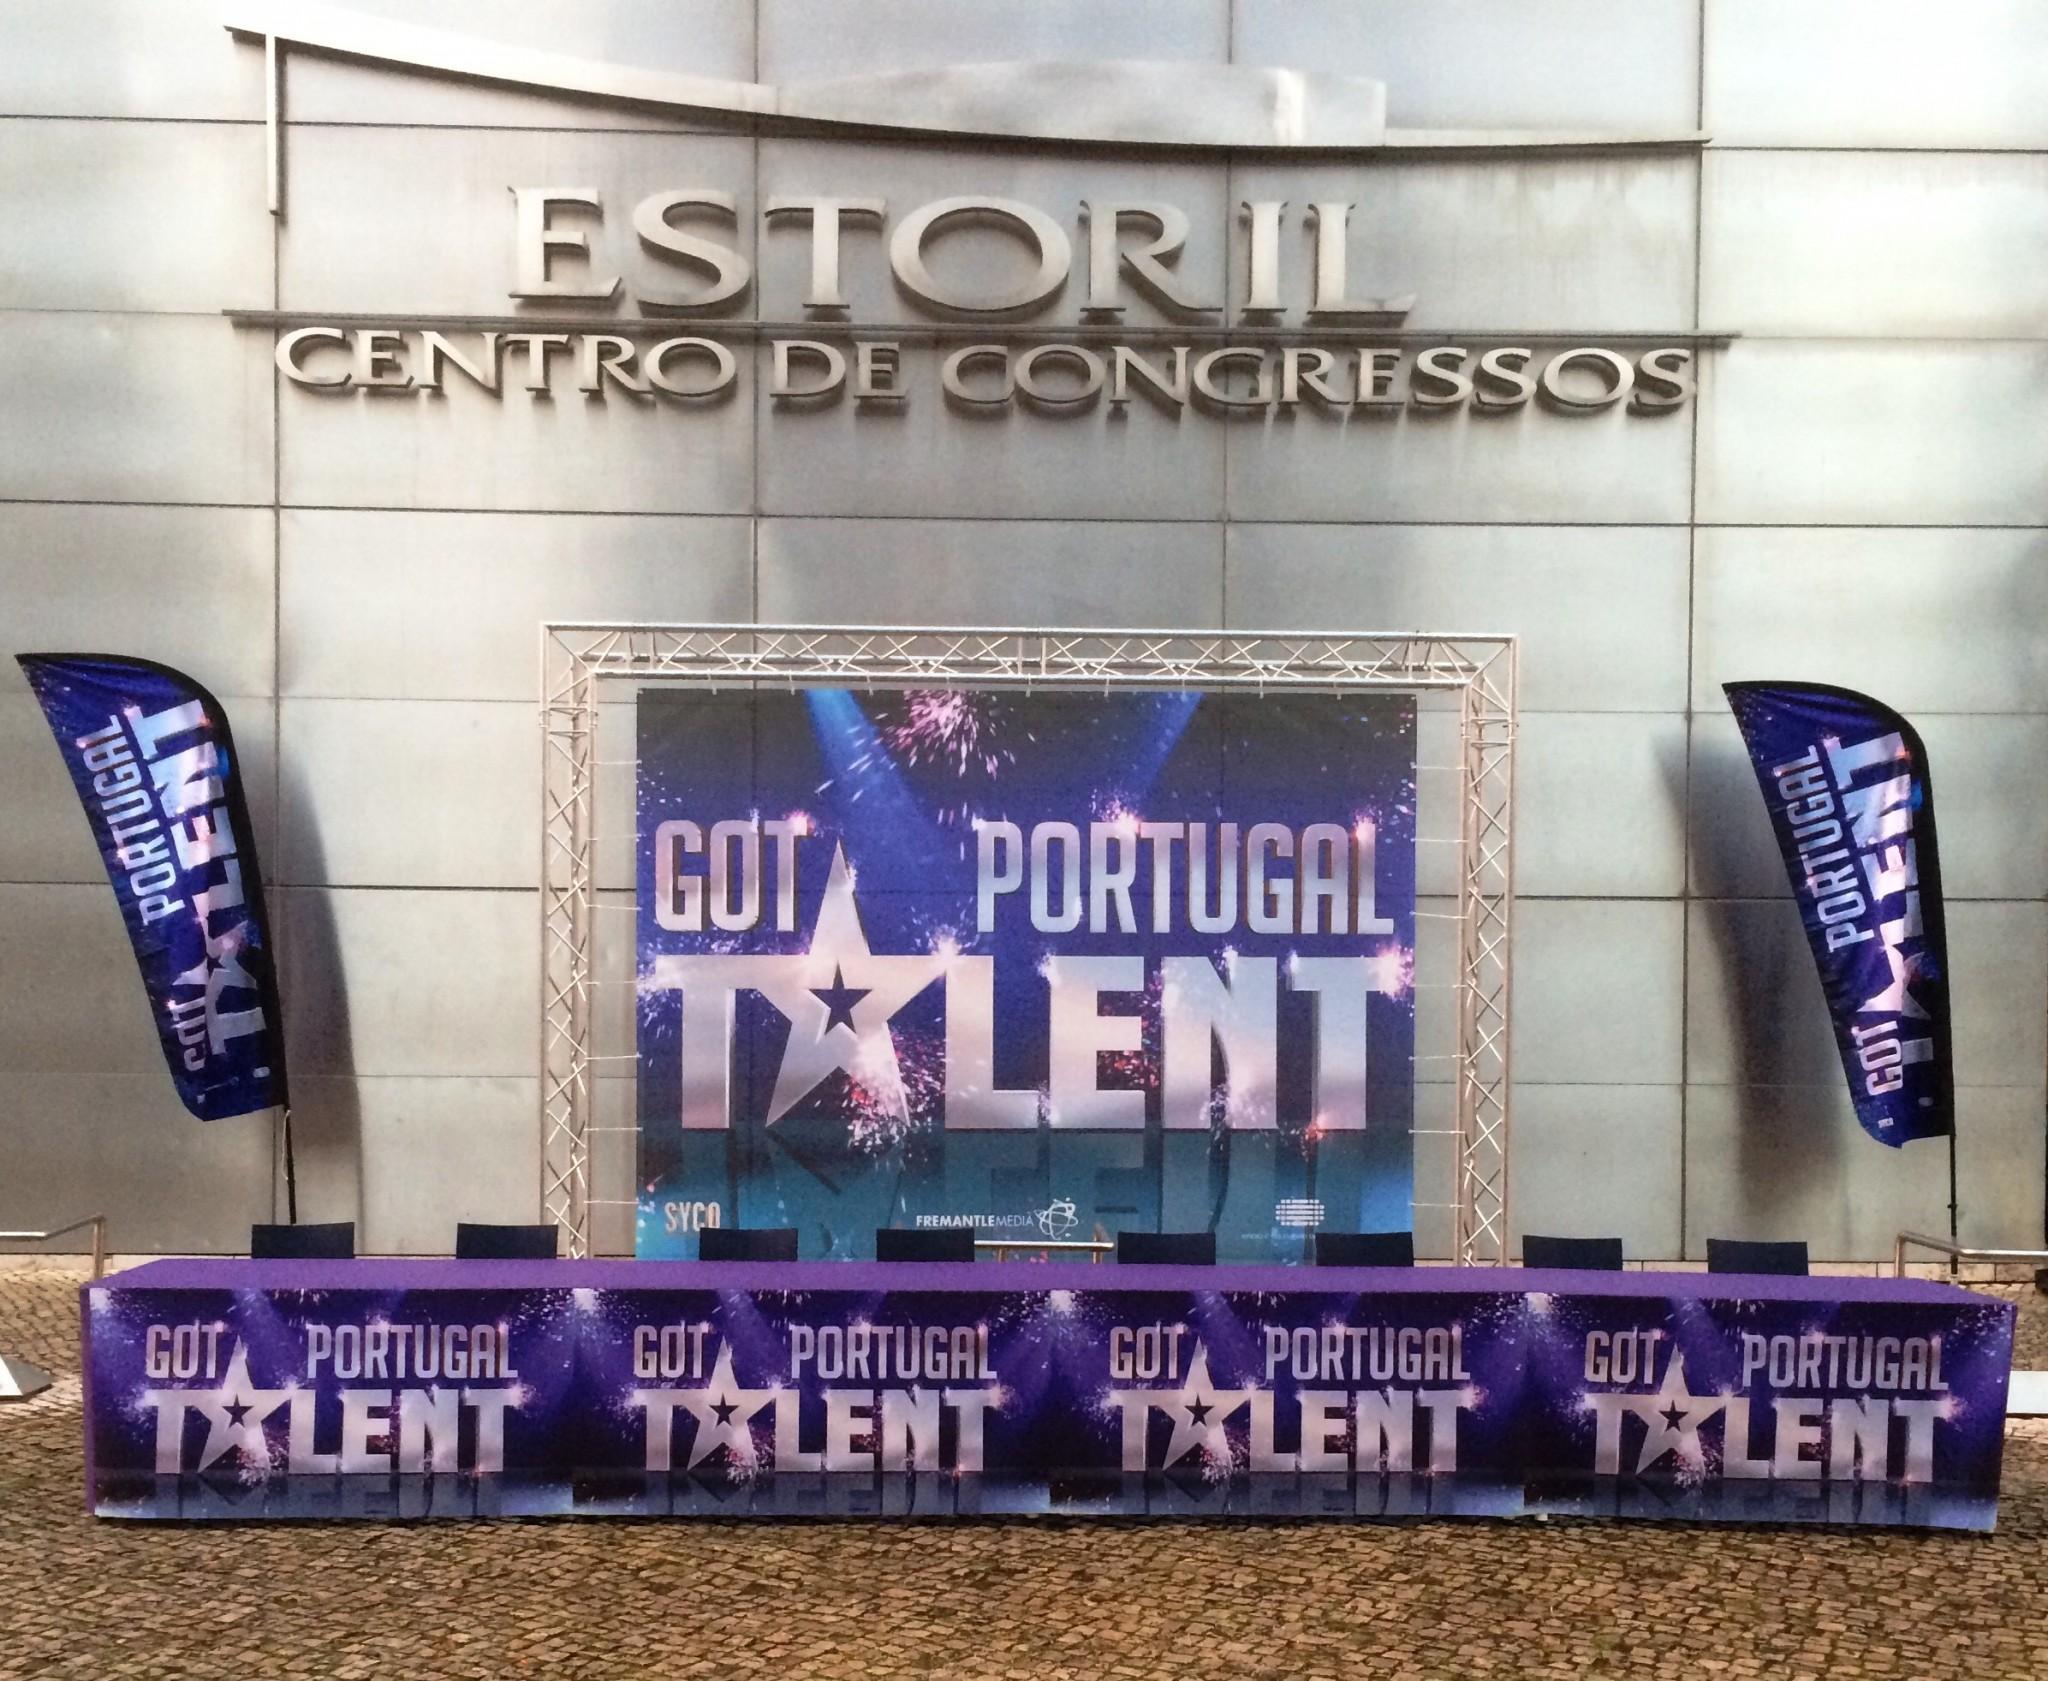 Got Talent Portugal 02 Estoril 011 «Got Talent Portugal»: Estoril Acolhe Mais De 3 Mil Candidatos [Com Fotos]